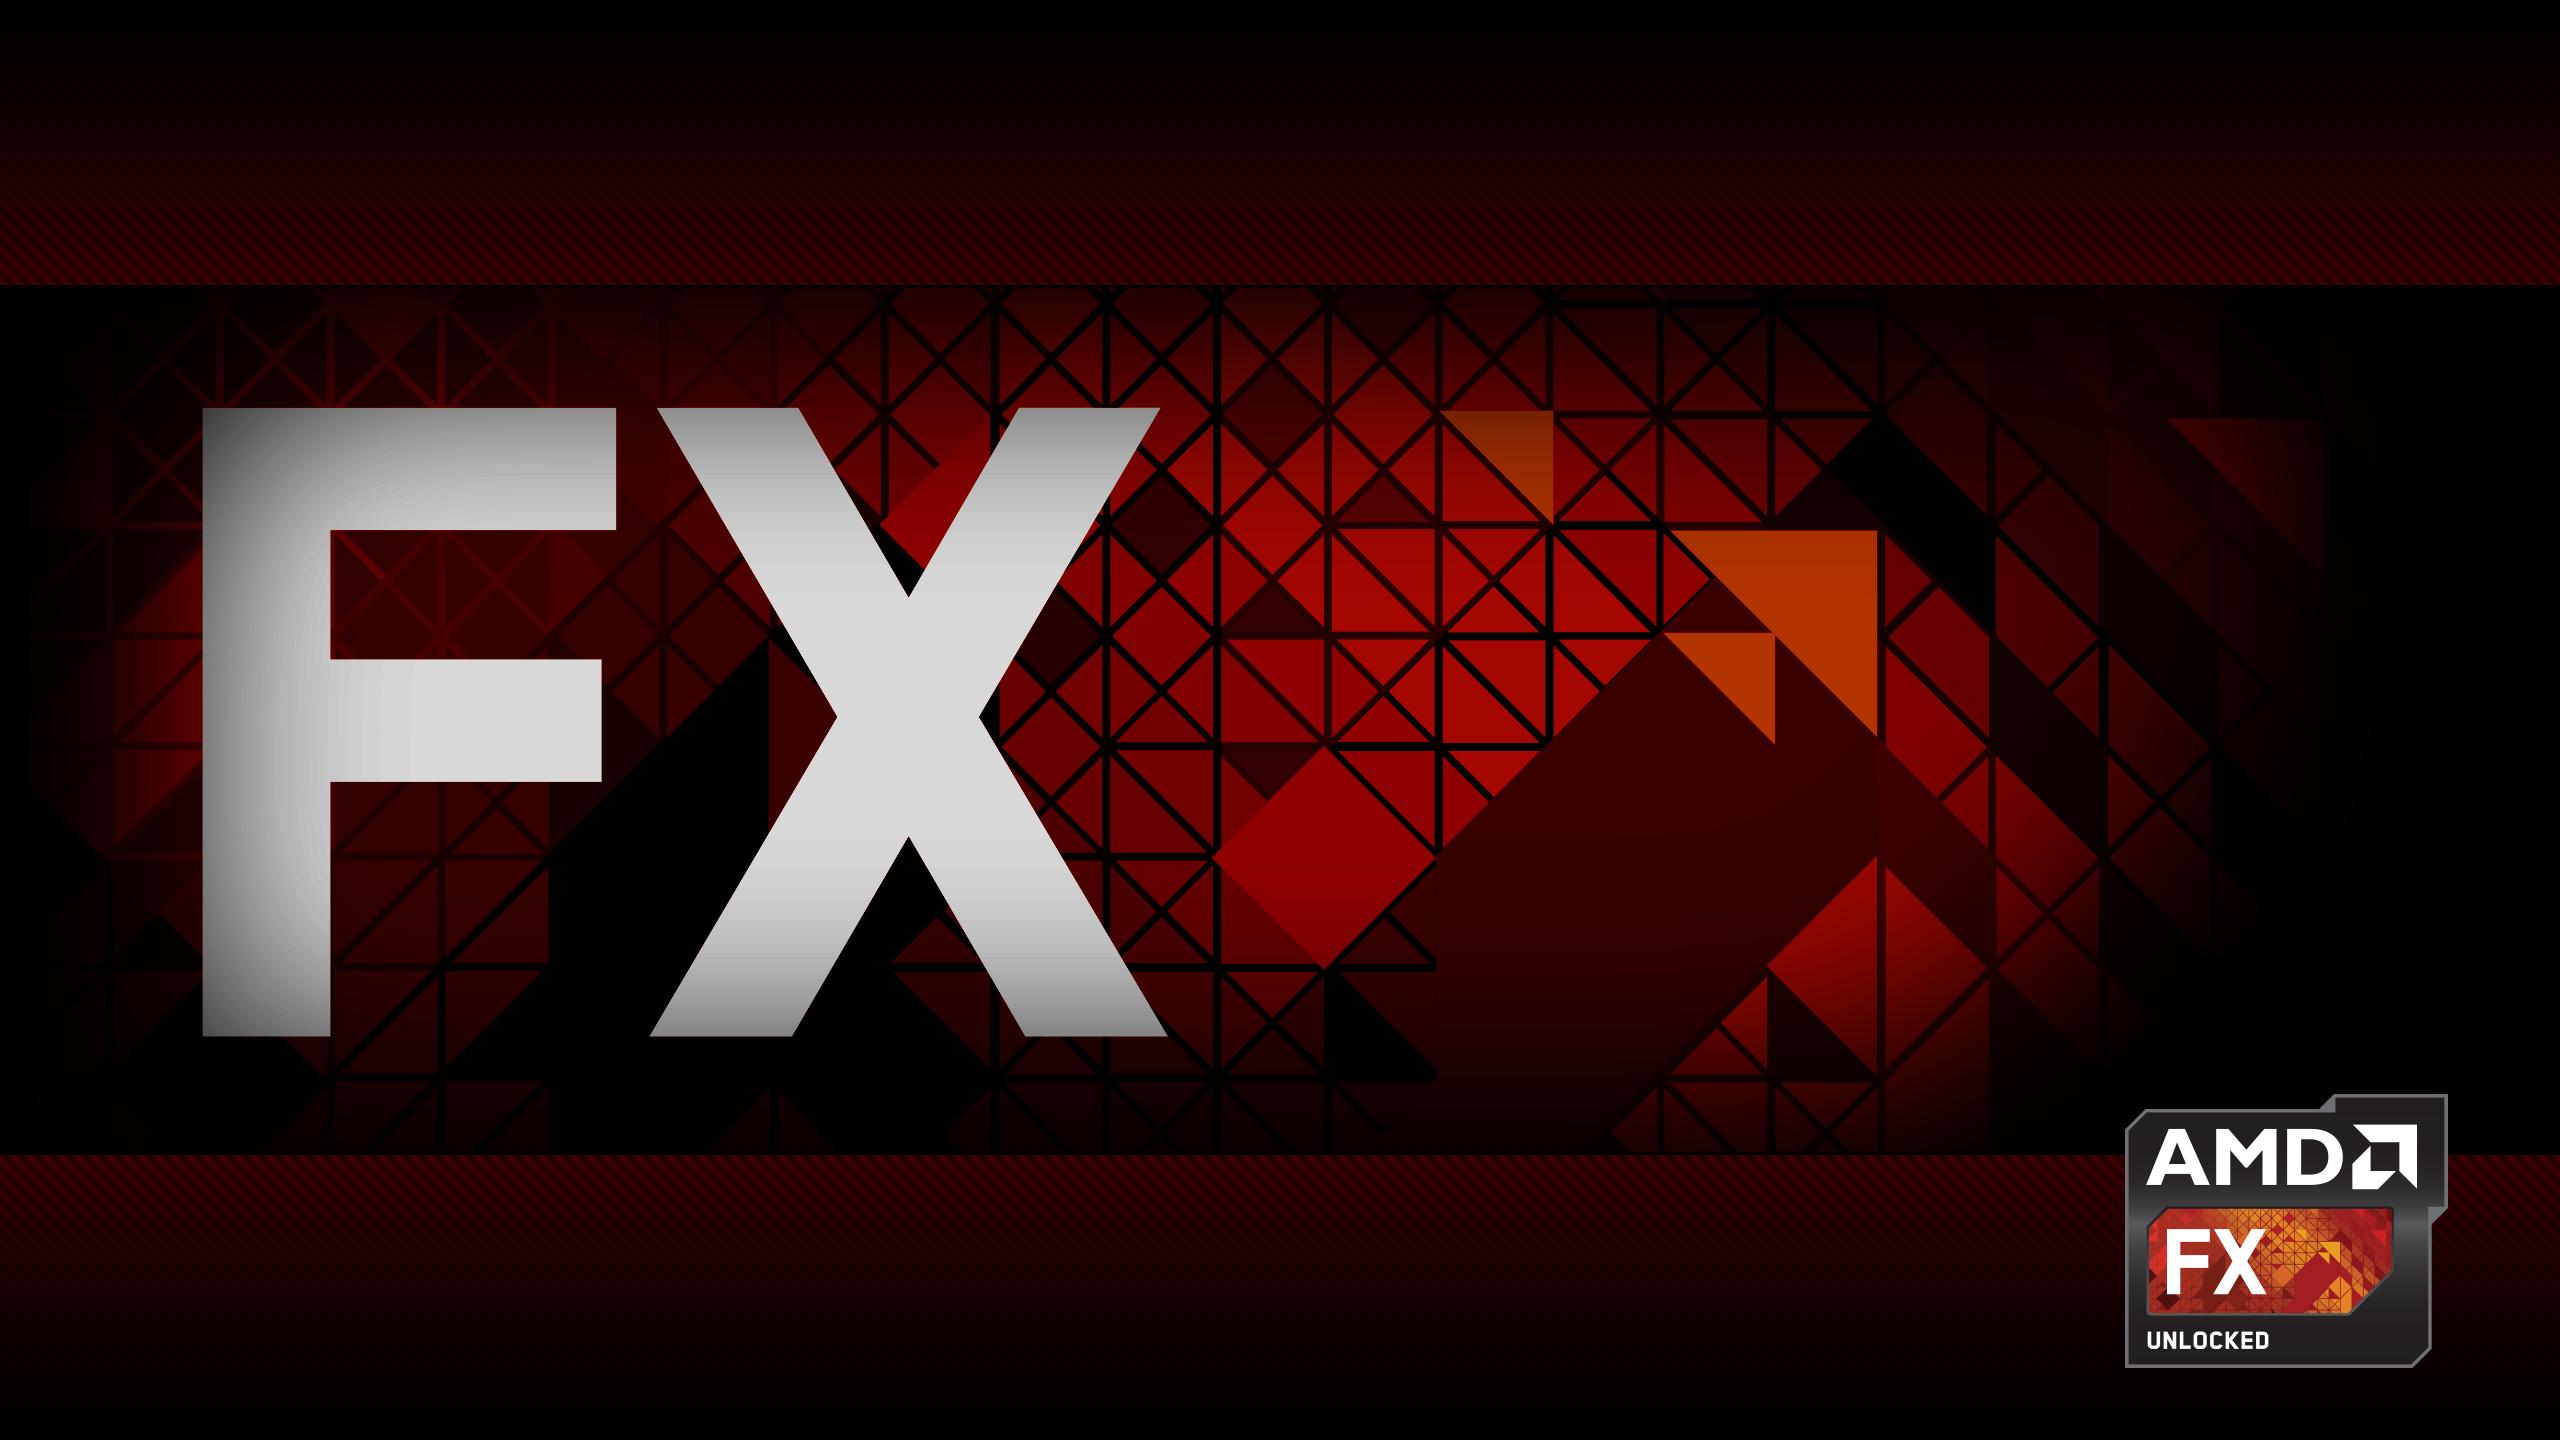 AMD FX Wallpaper